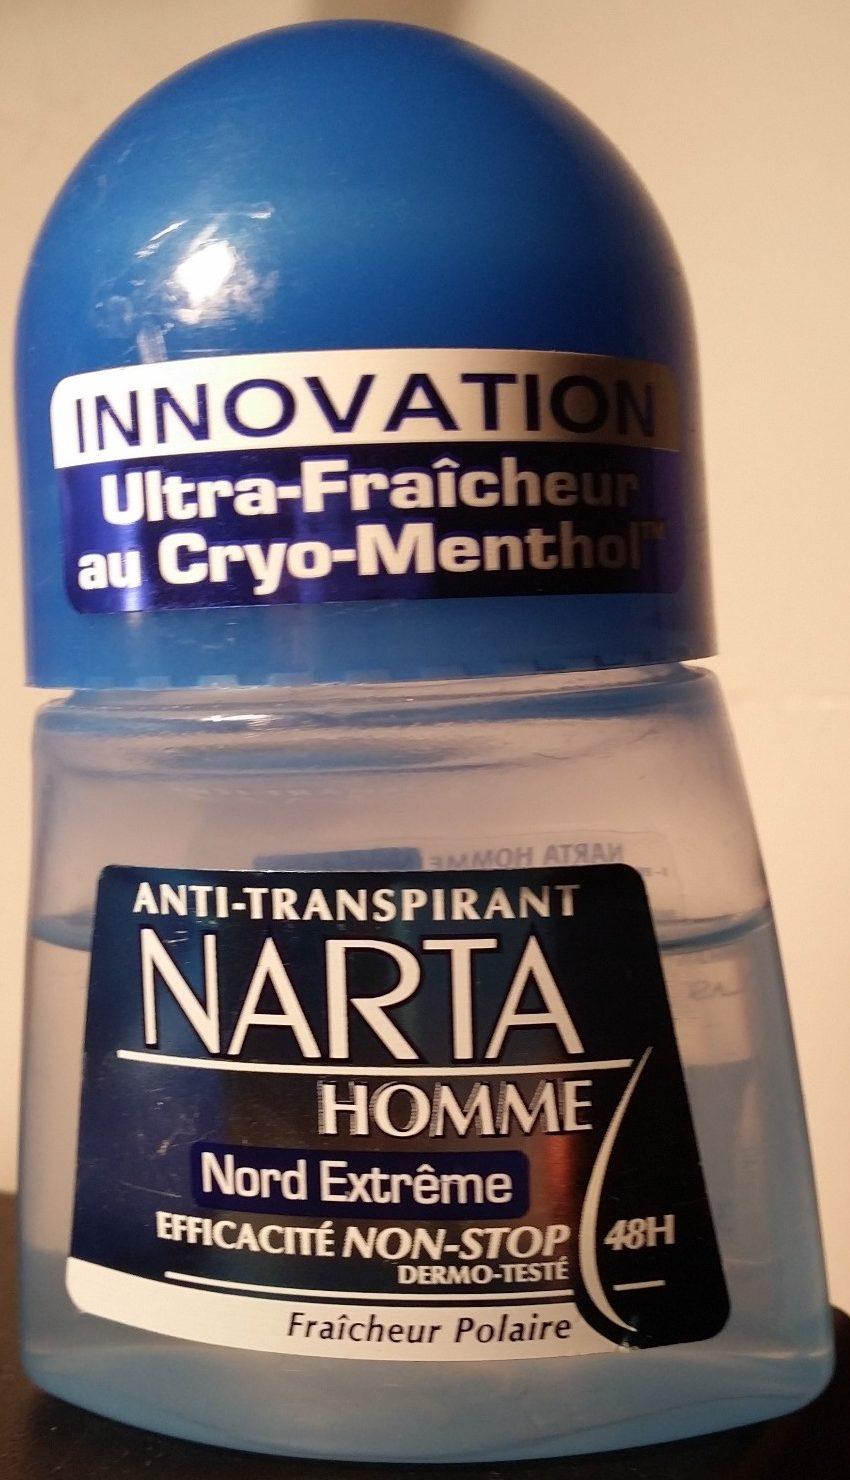 Narta Anti-transpirant Nord extreme - Product - fr